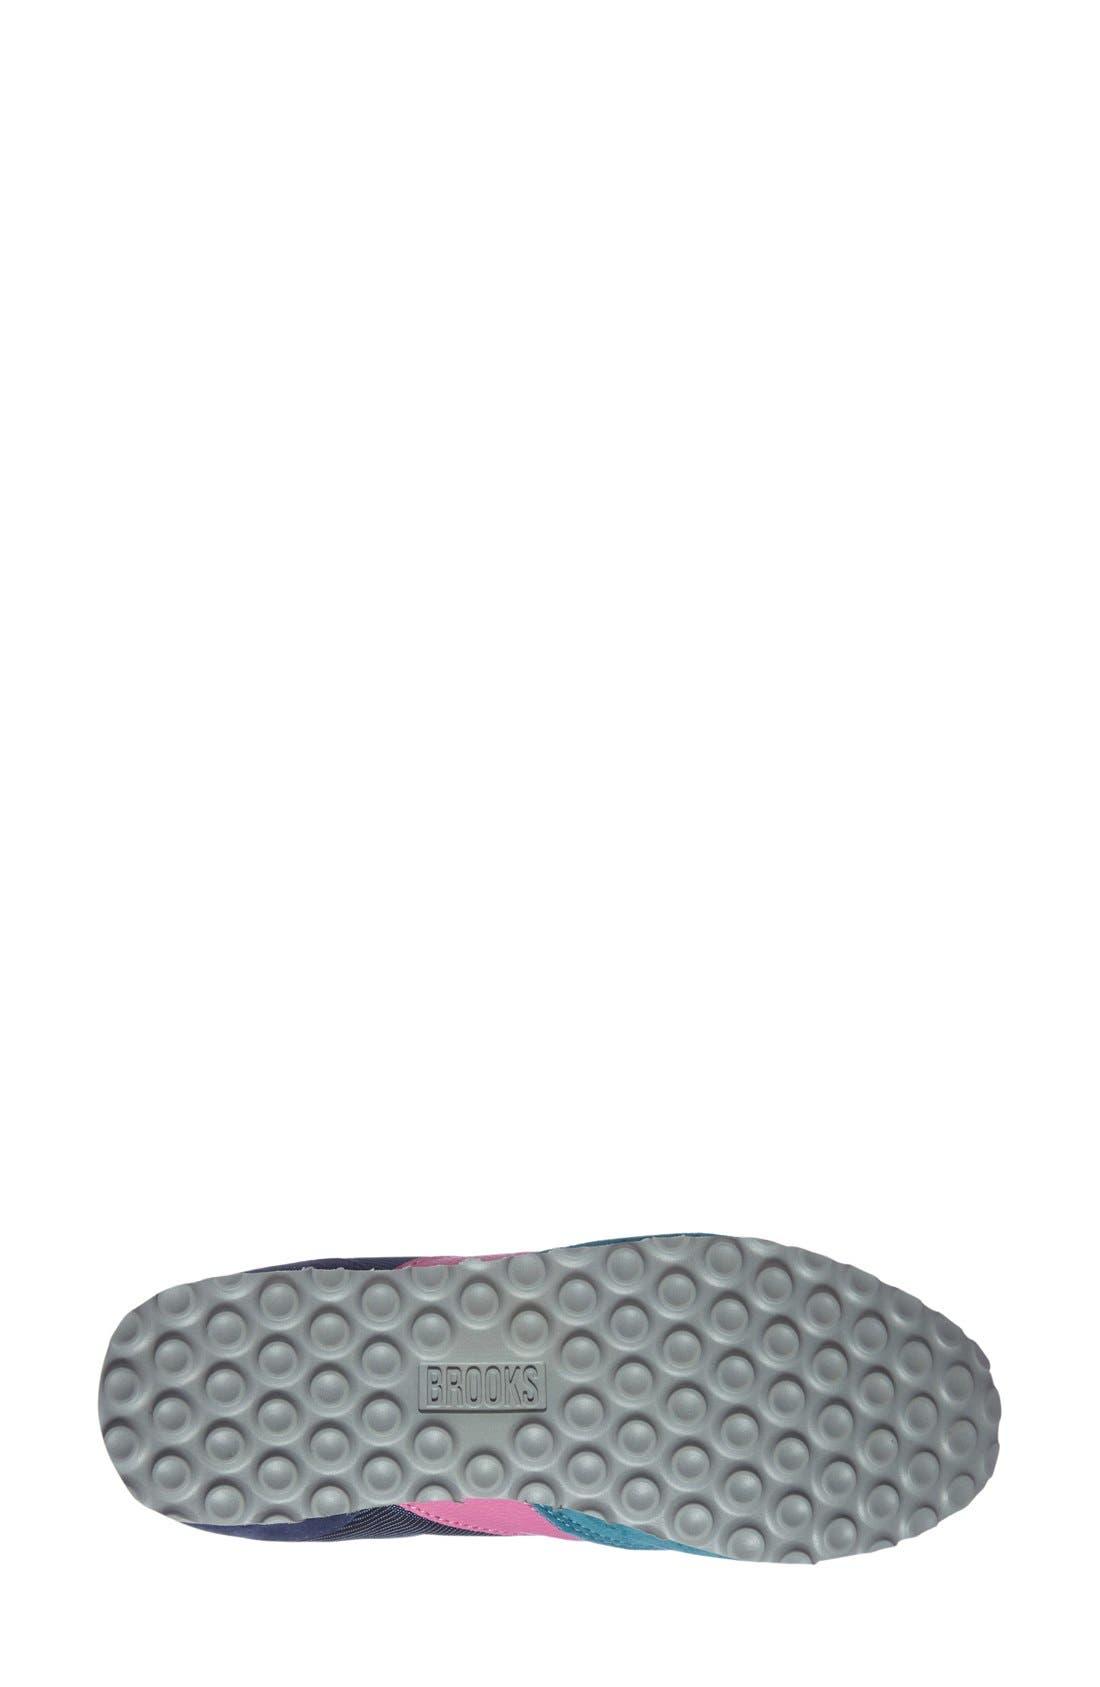 'Vanguard' Sneaker,                             Alternate thumbnail 167, color,